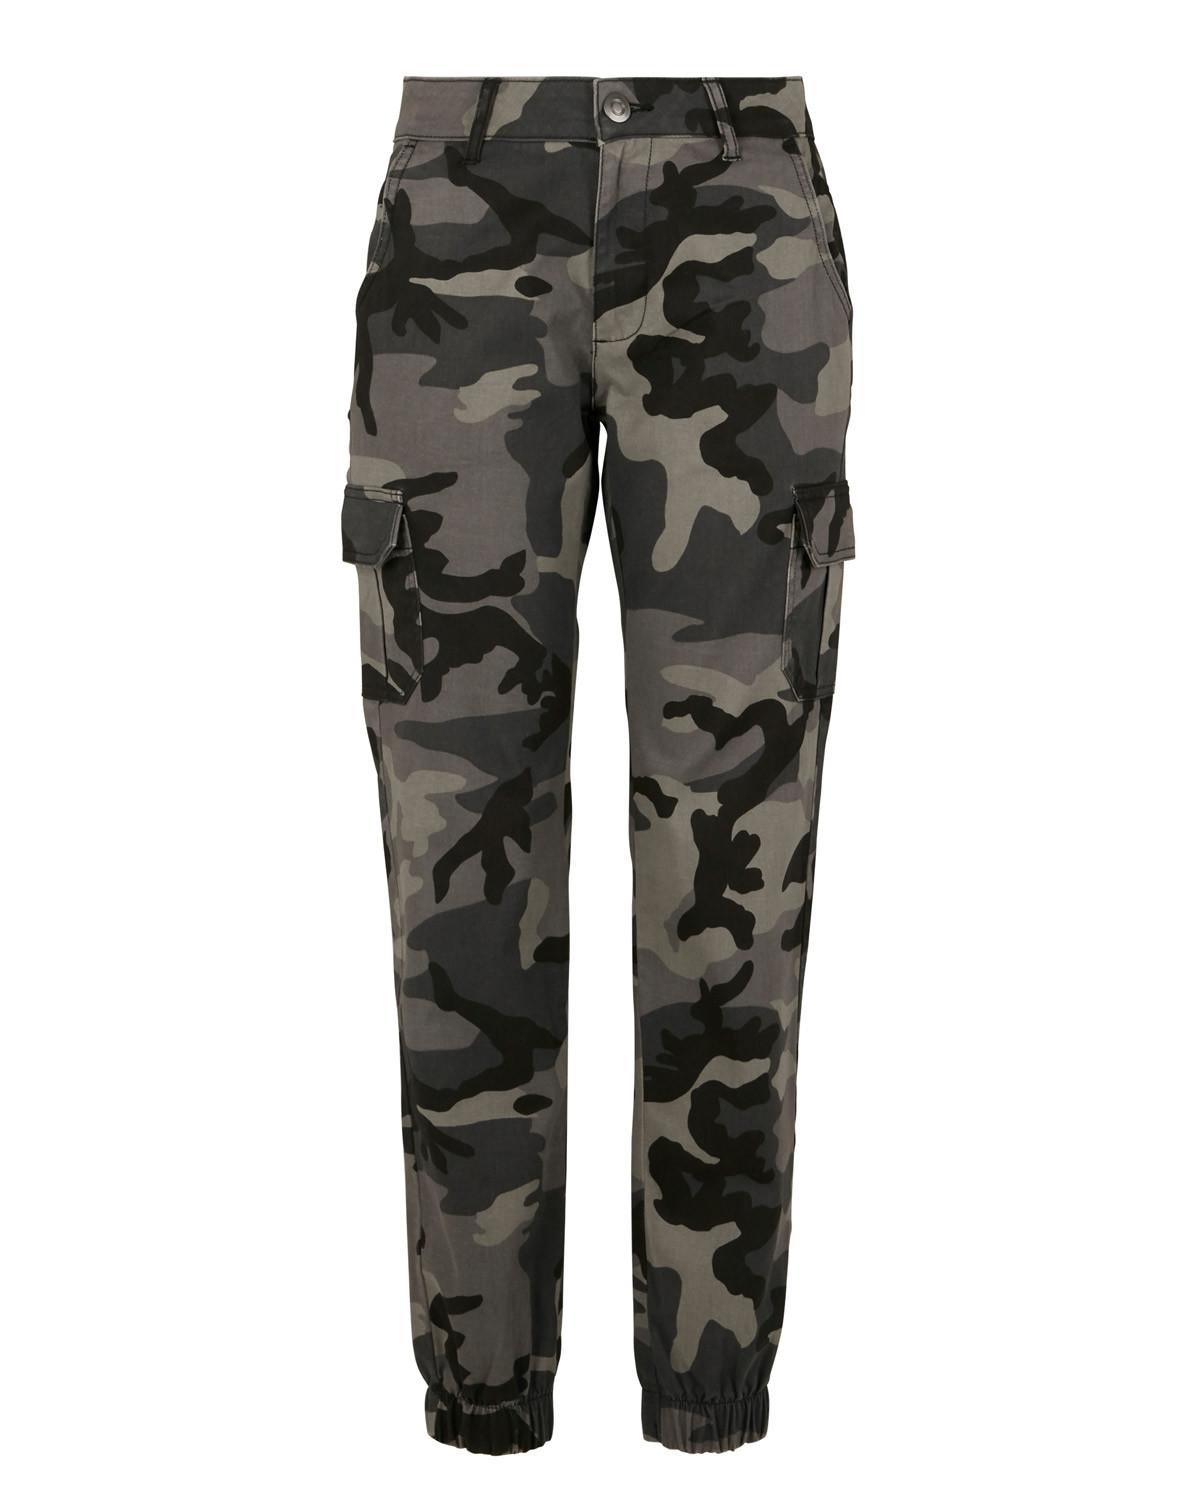 Urban Classics Ladies High Waist Camo Cargo Pants (Dark Camo, W29)